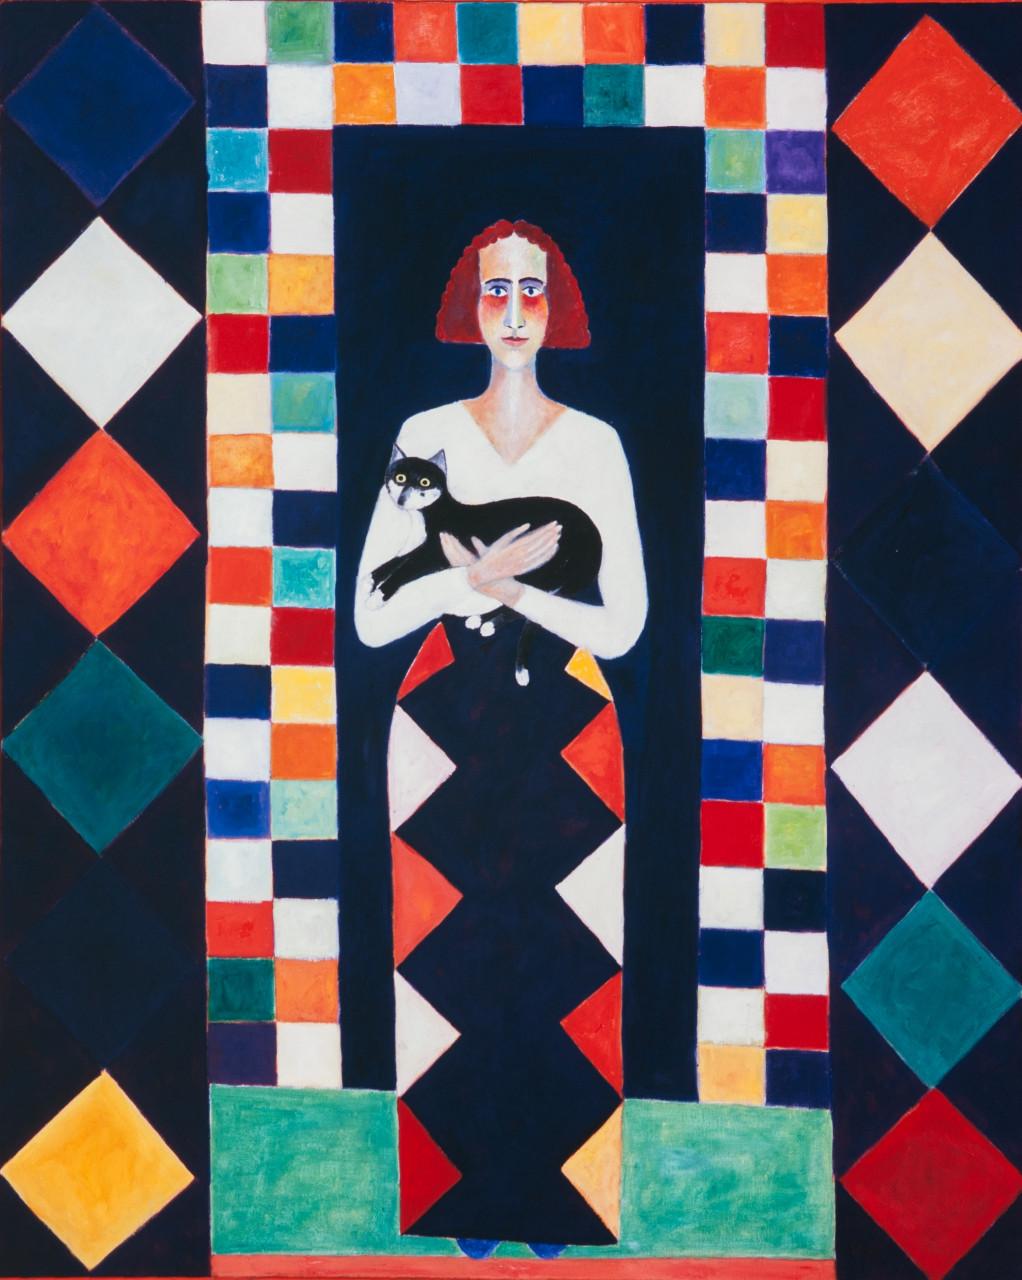 Monika mit Katze 1988 Öl auf Leinwand 110x140cm